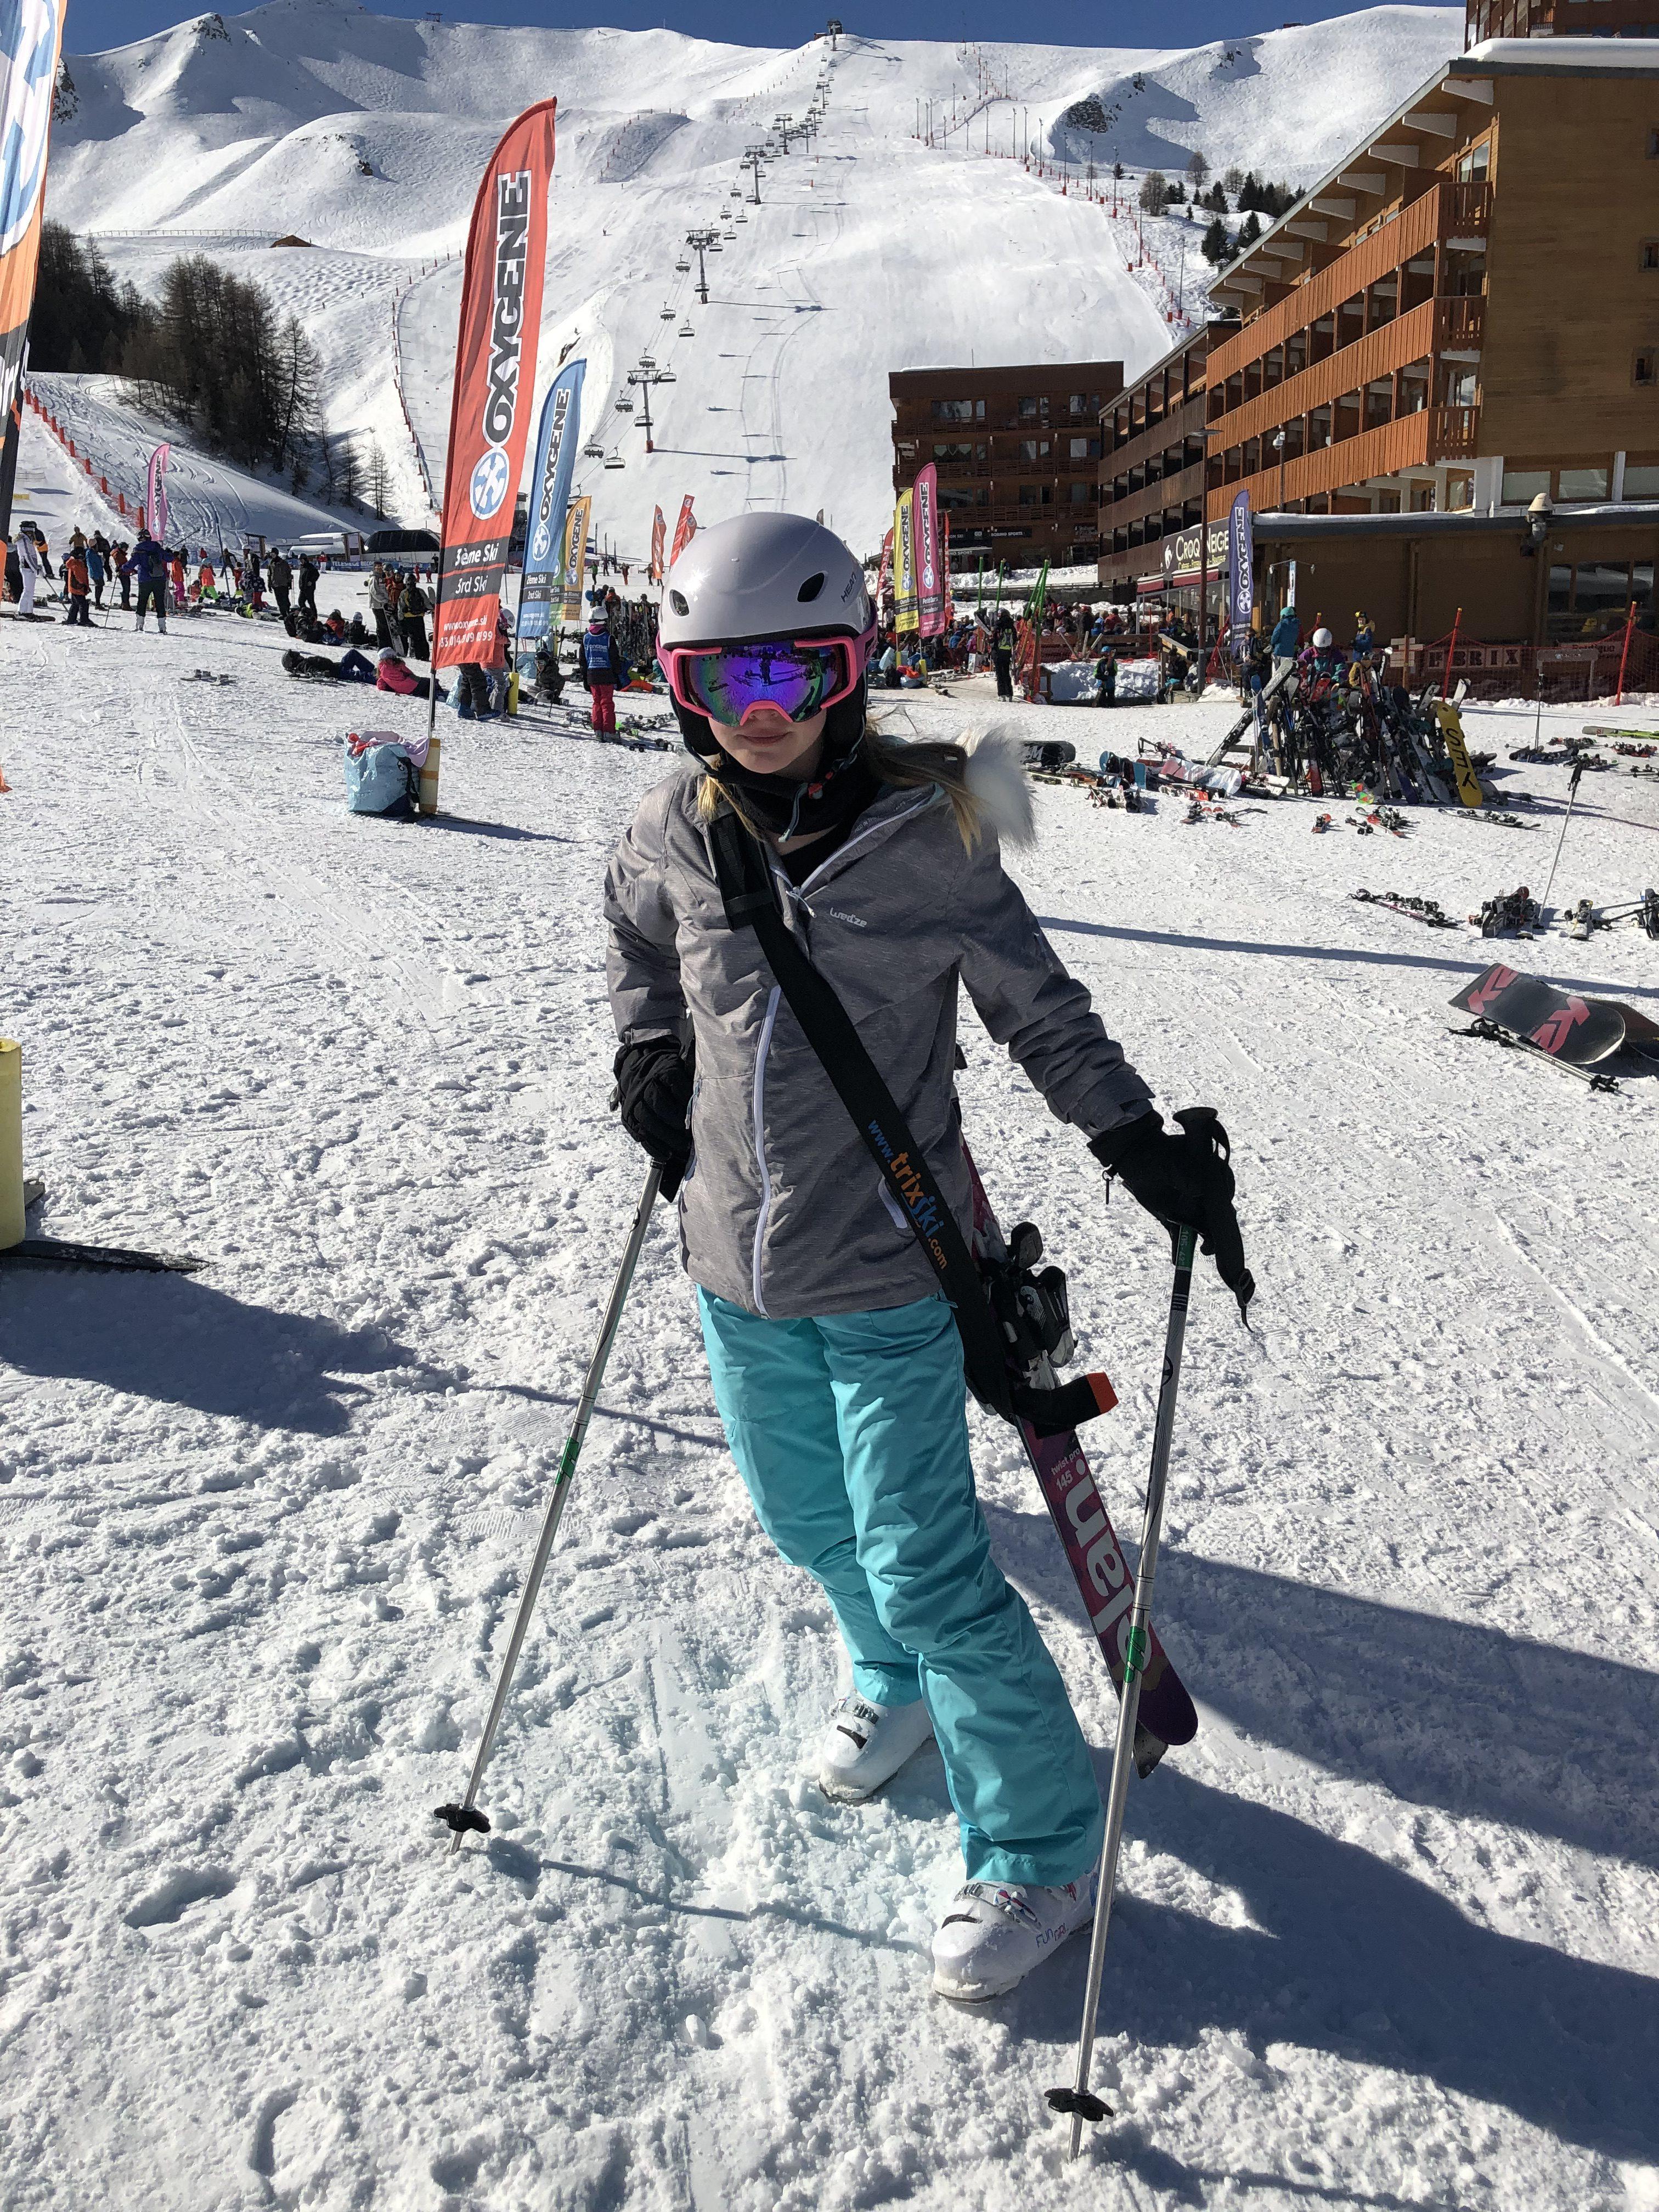 trixski, ski carrier